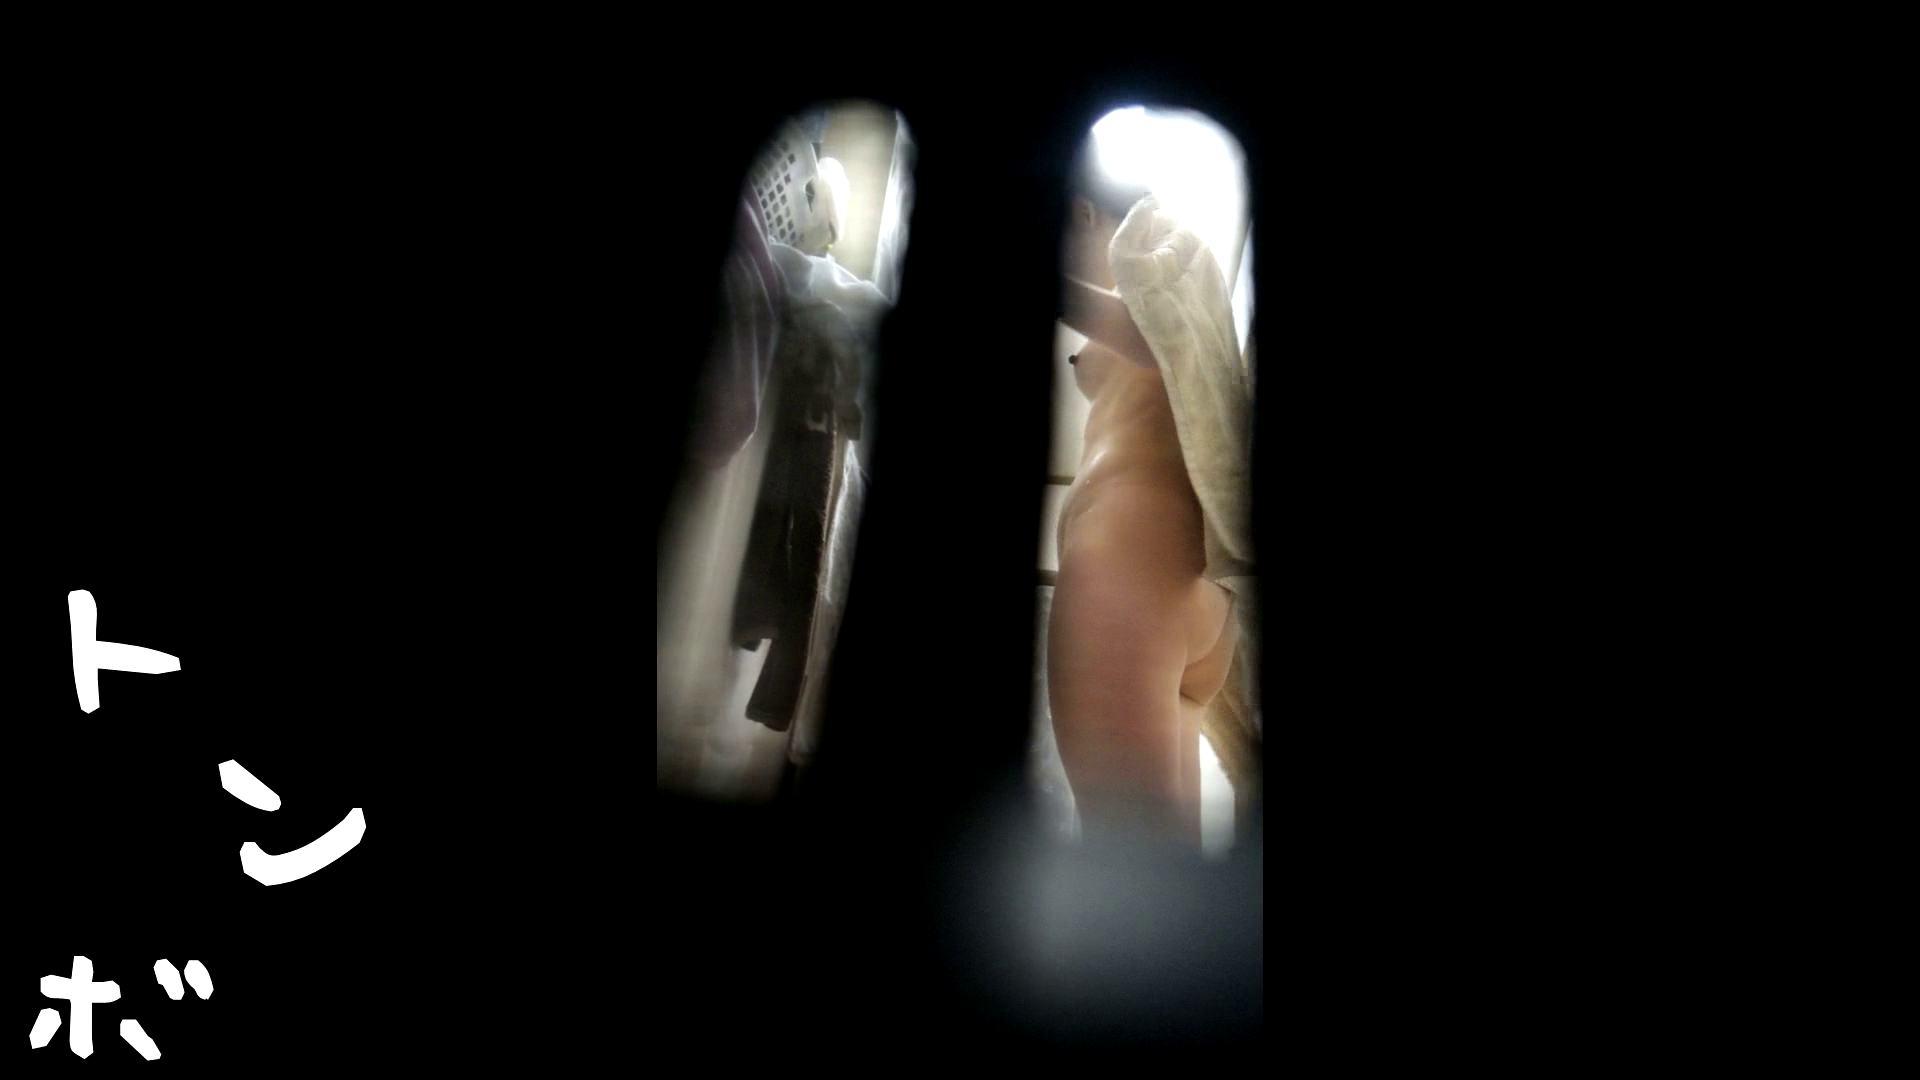 リアル盗撮 美人服飾専門学生の私生活 潜入 セックス無修正動画無料 24枚